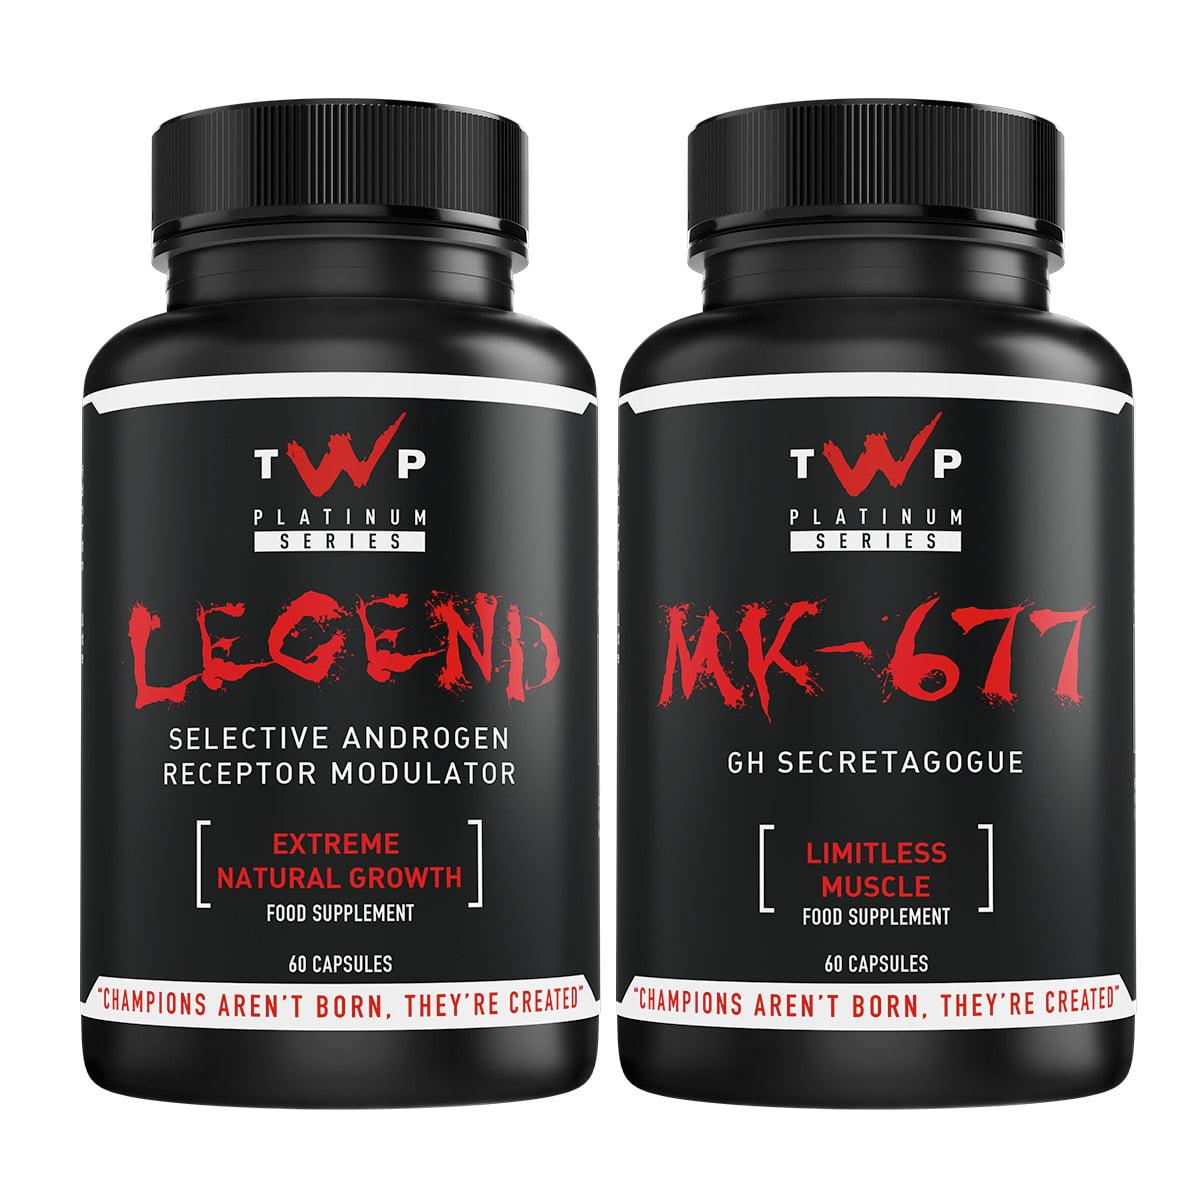 TWP Legend/MK-677 stack